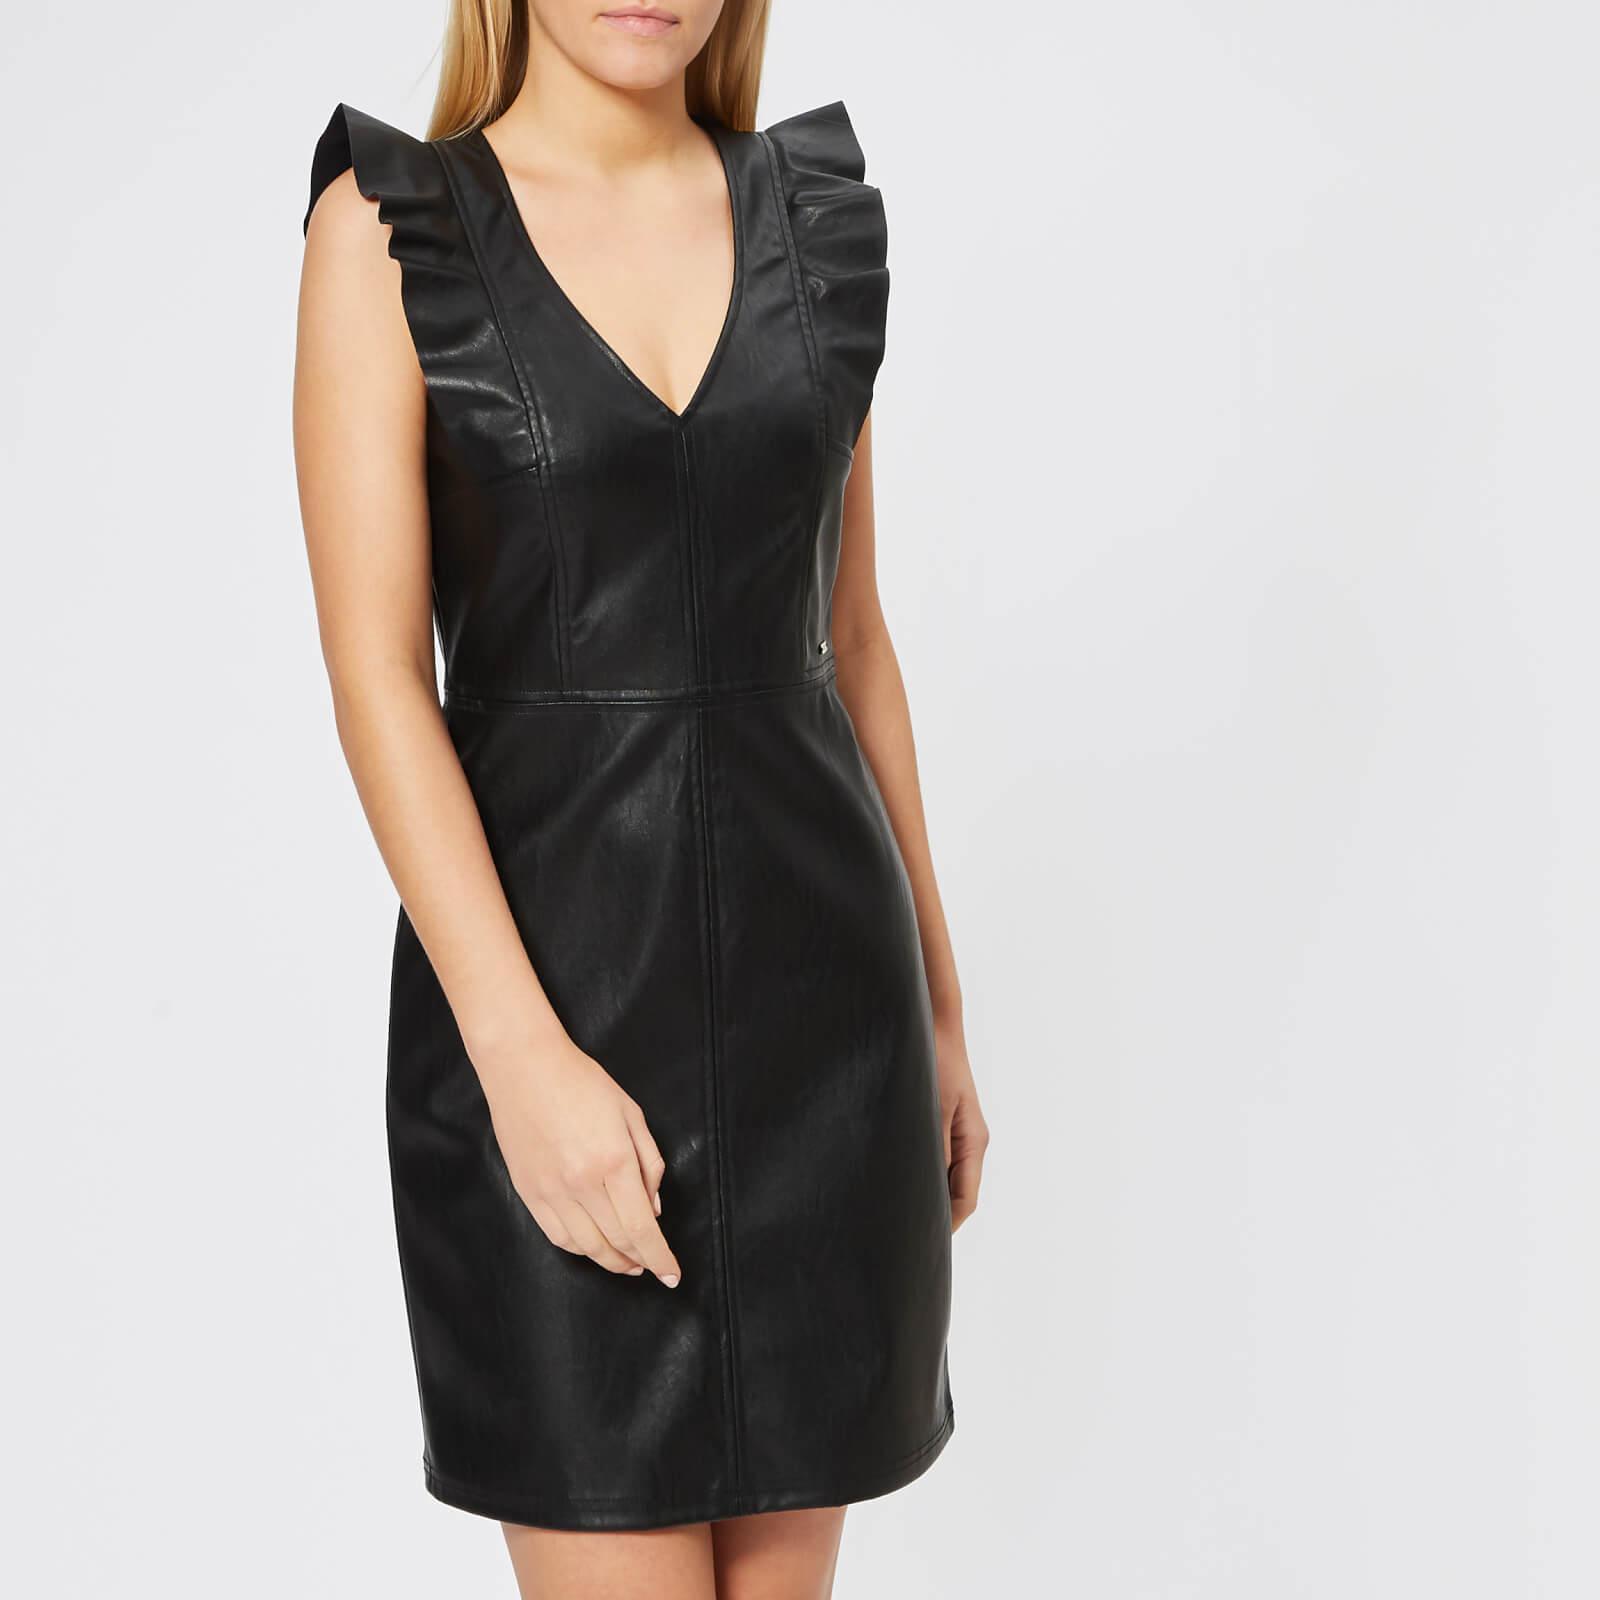 7a43b177dc3359 Lyst - Armani Exchange Stretch Echo Leather Look Dress in Black